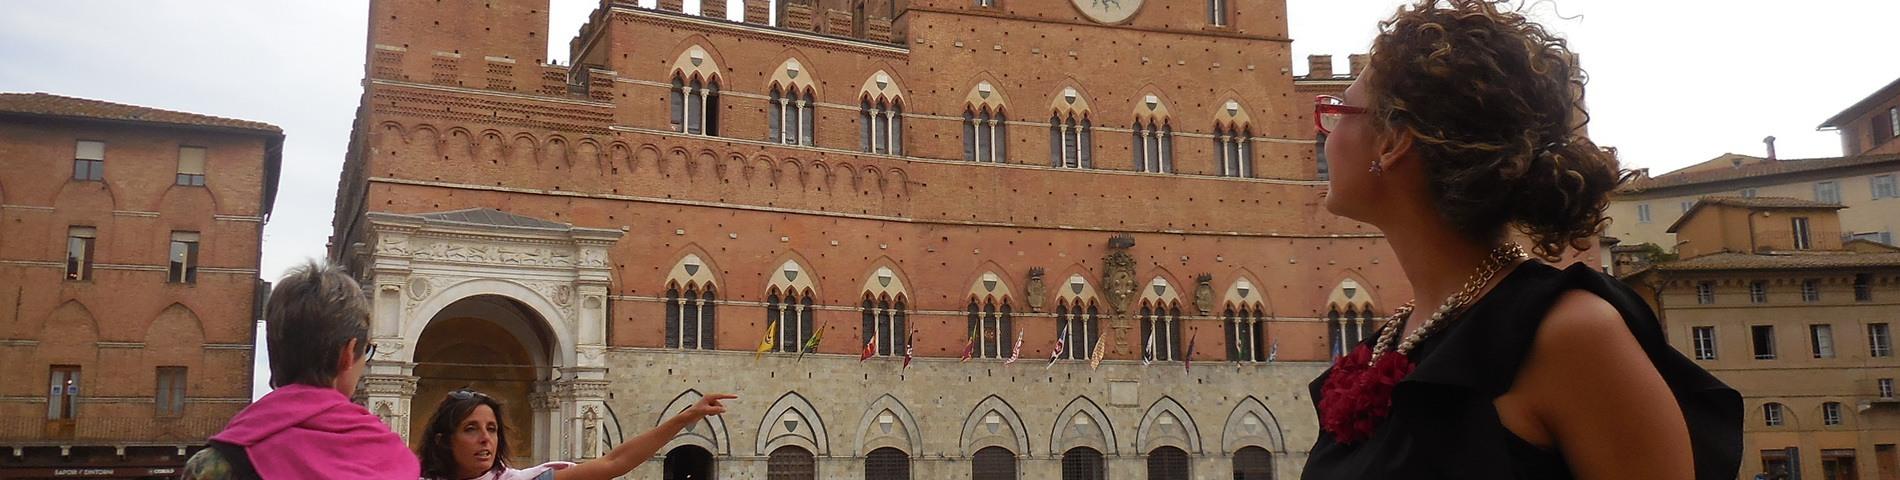 Scuola Leonardo da Vinci snímek 1